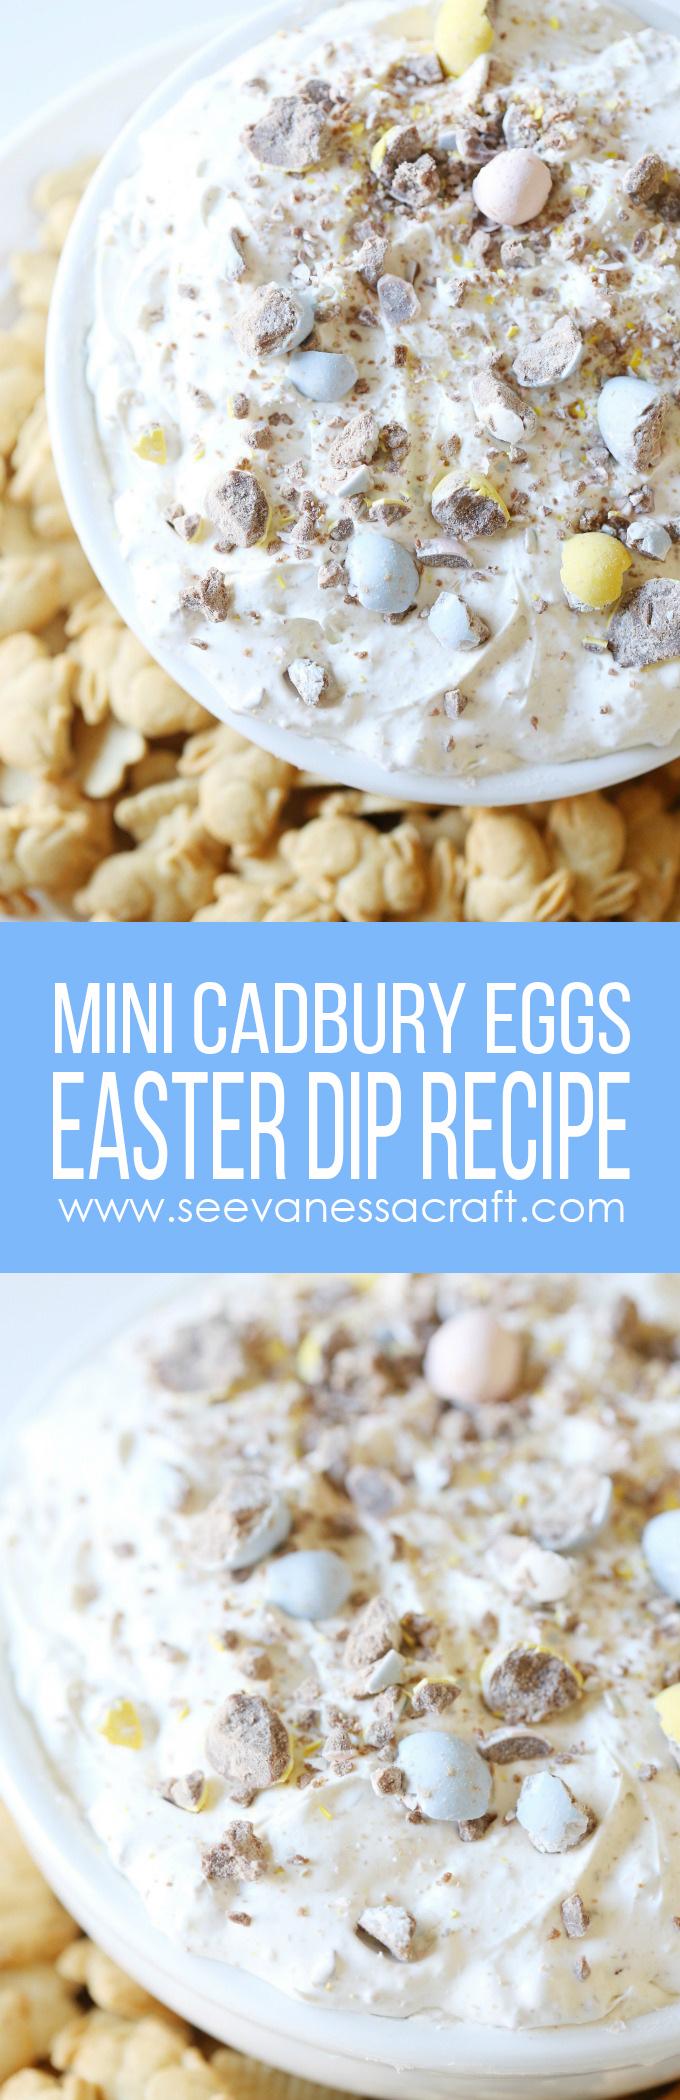 Easy Easter No Bake Cadbury Mini Eggs Dip Recipe